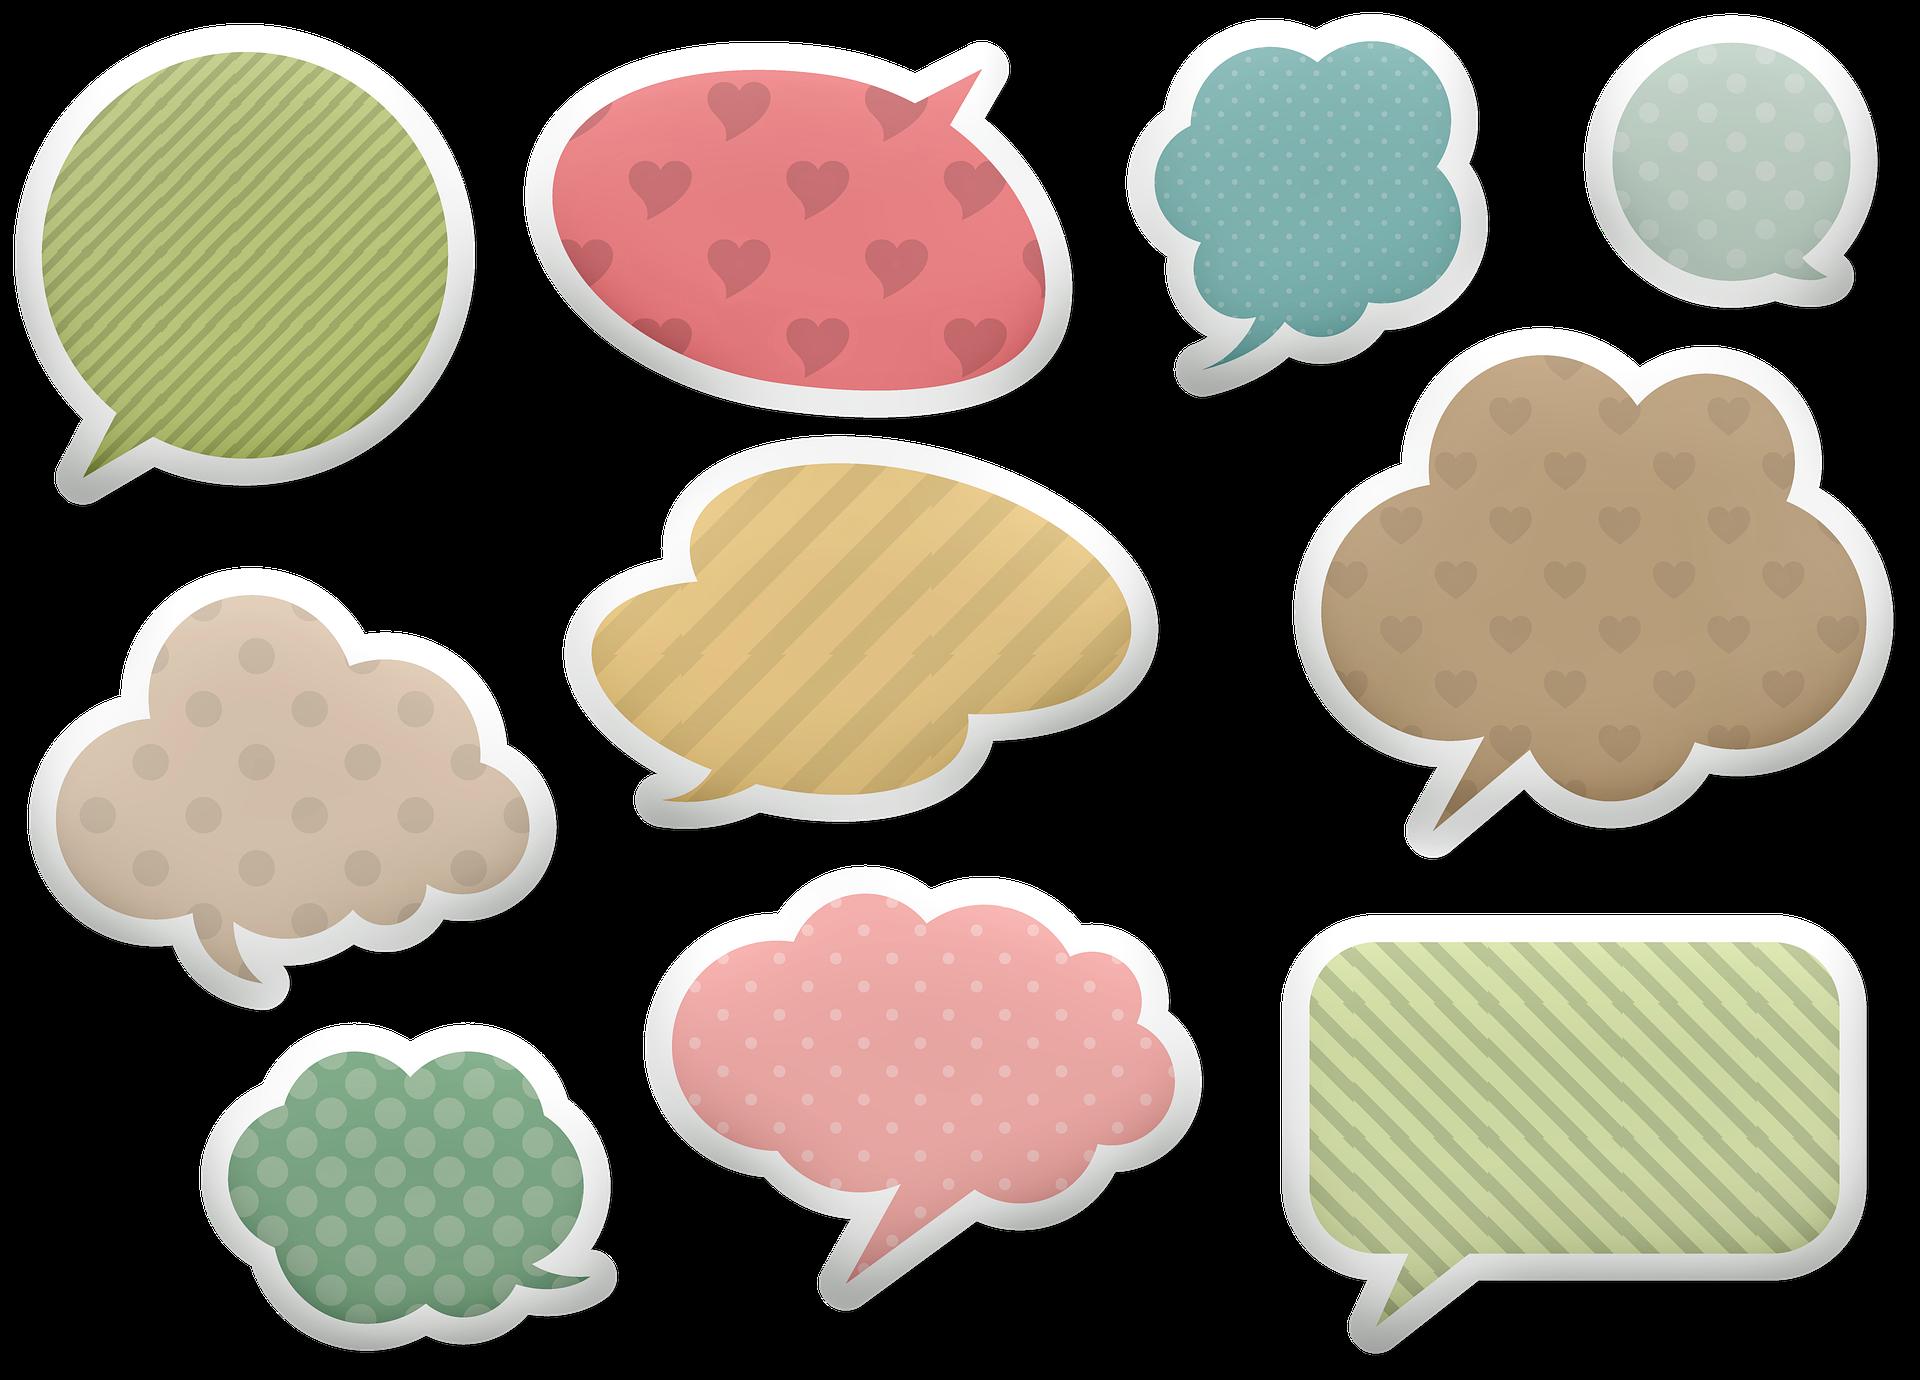 speech-bubbles-5312113_1920